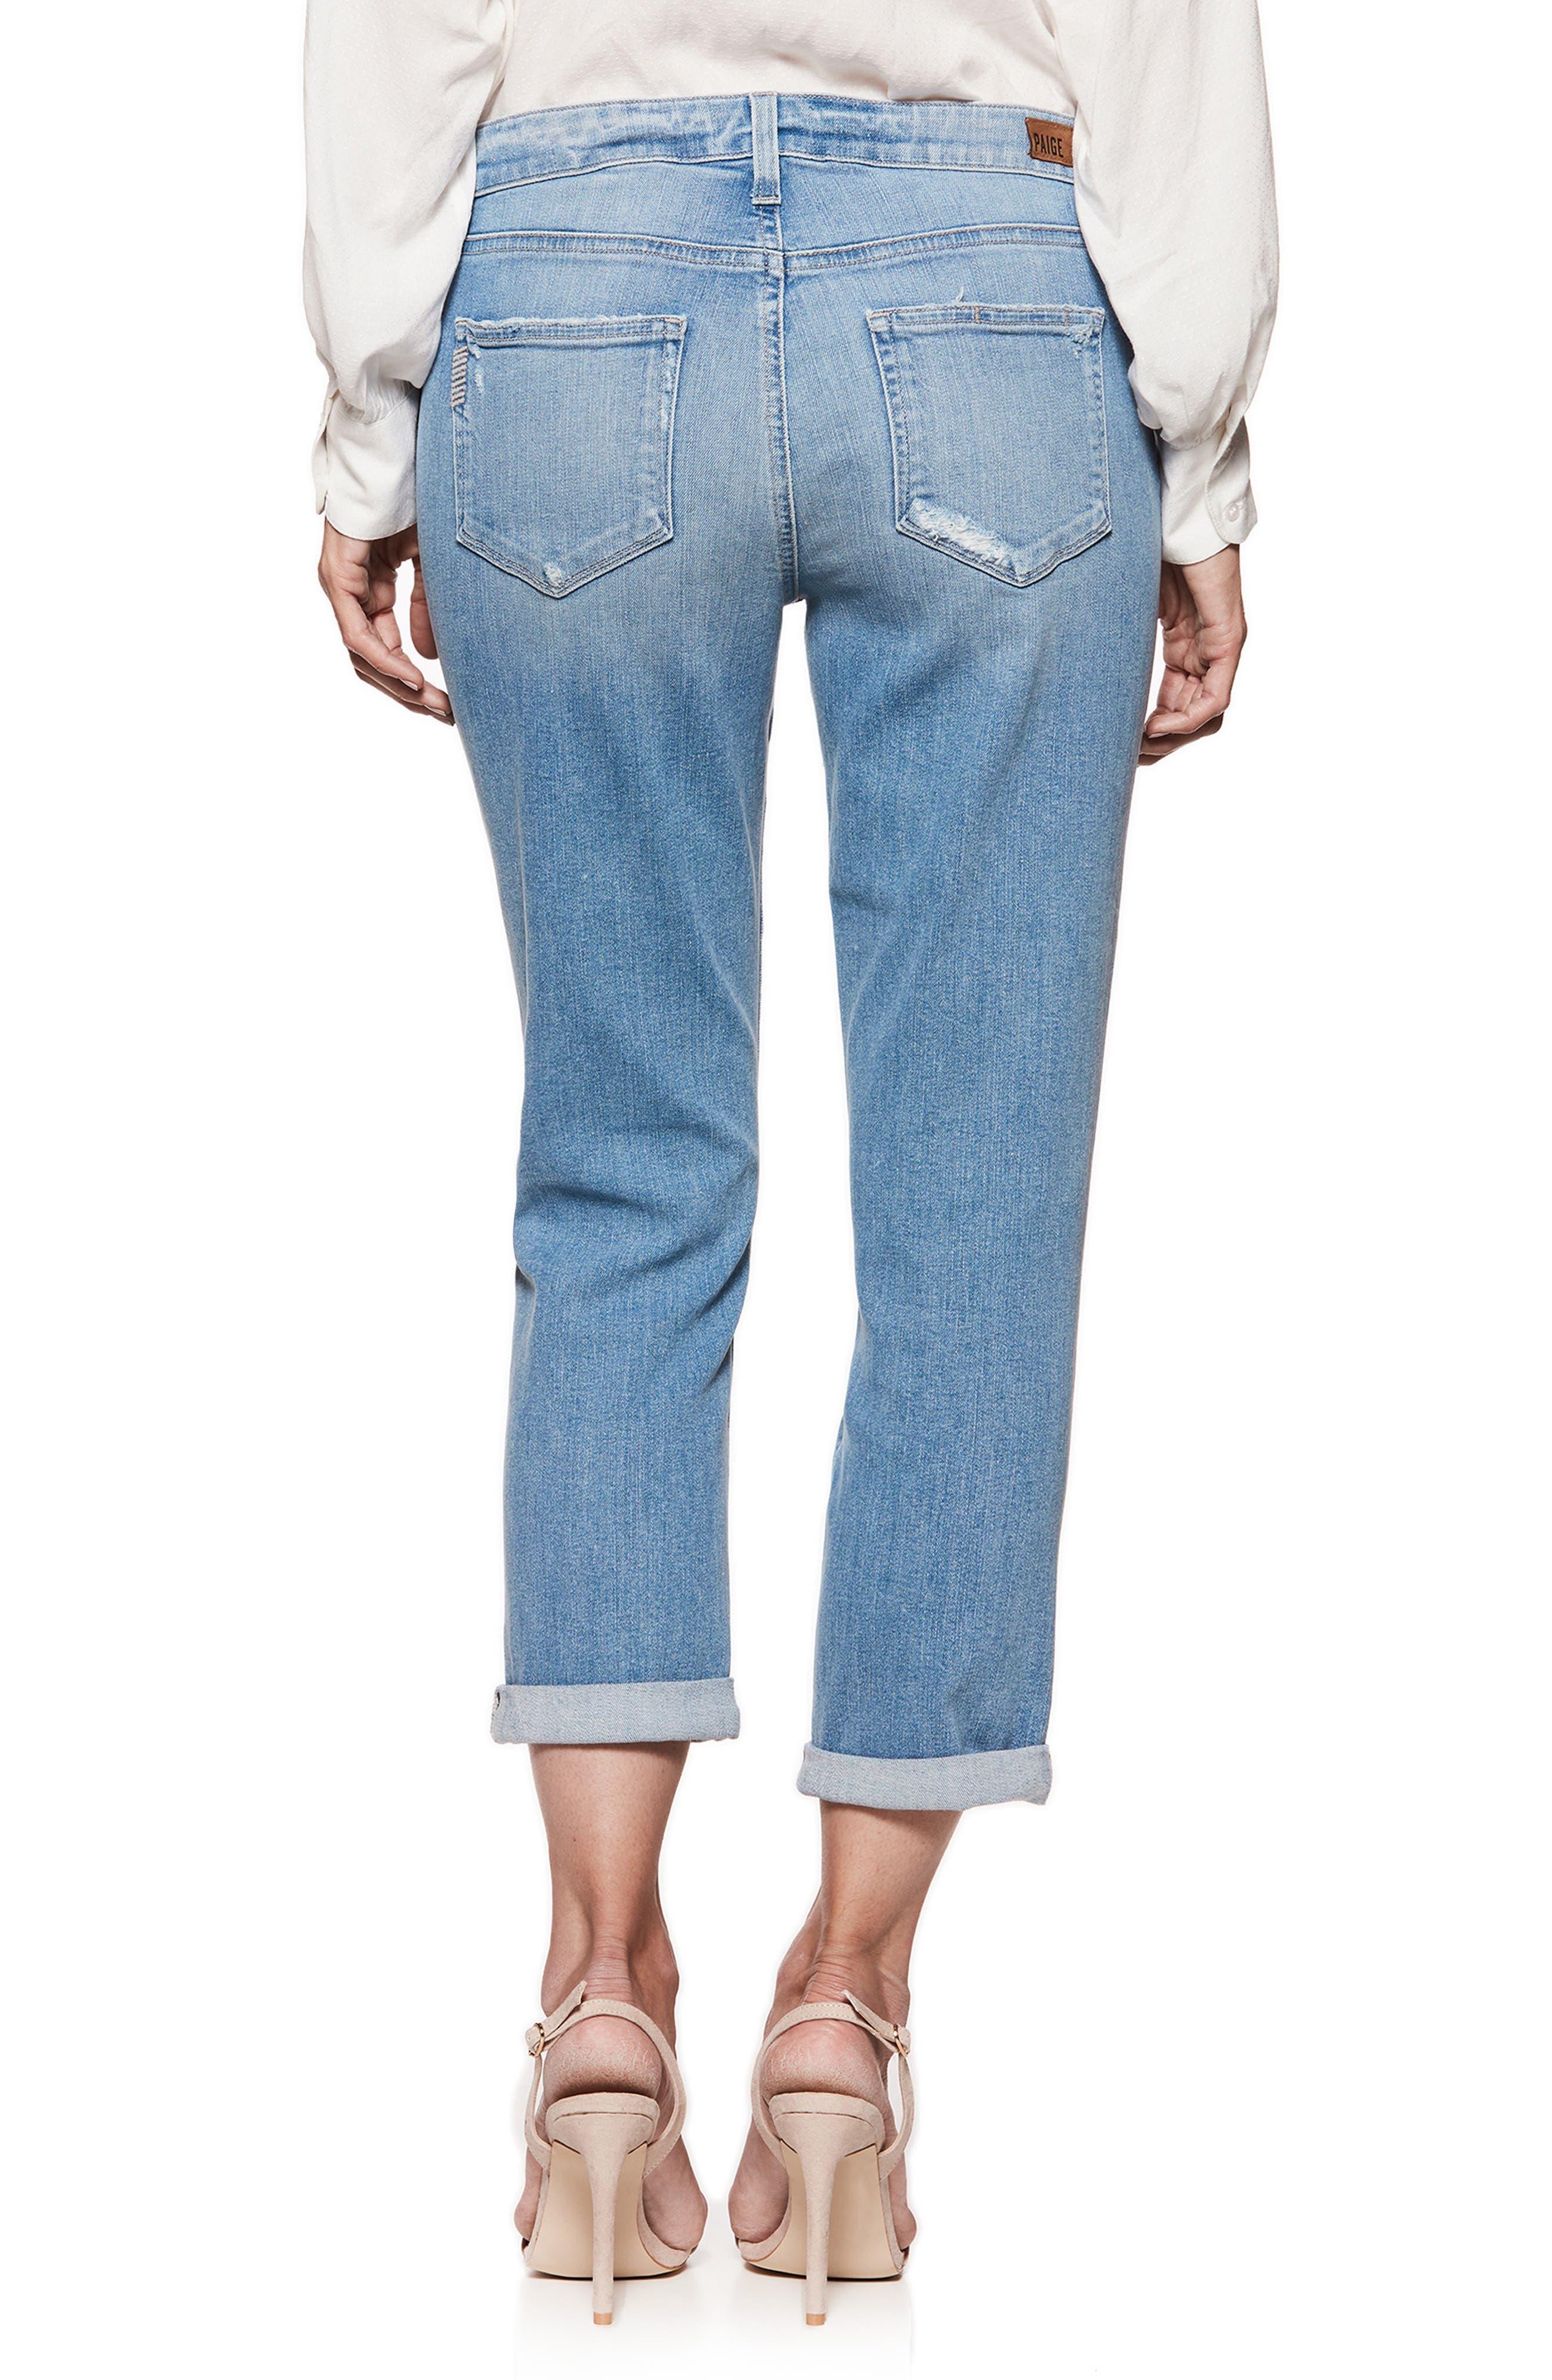 Transcend Vintage - Jimmy Jimmy High Waist Crop Boyfriend Jeans,                             Alternate thumbnail 3, color,                             Atterbury